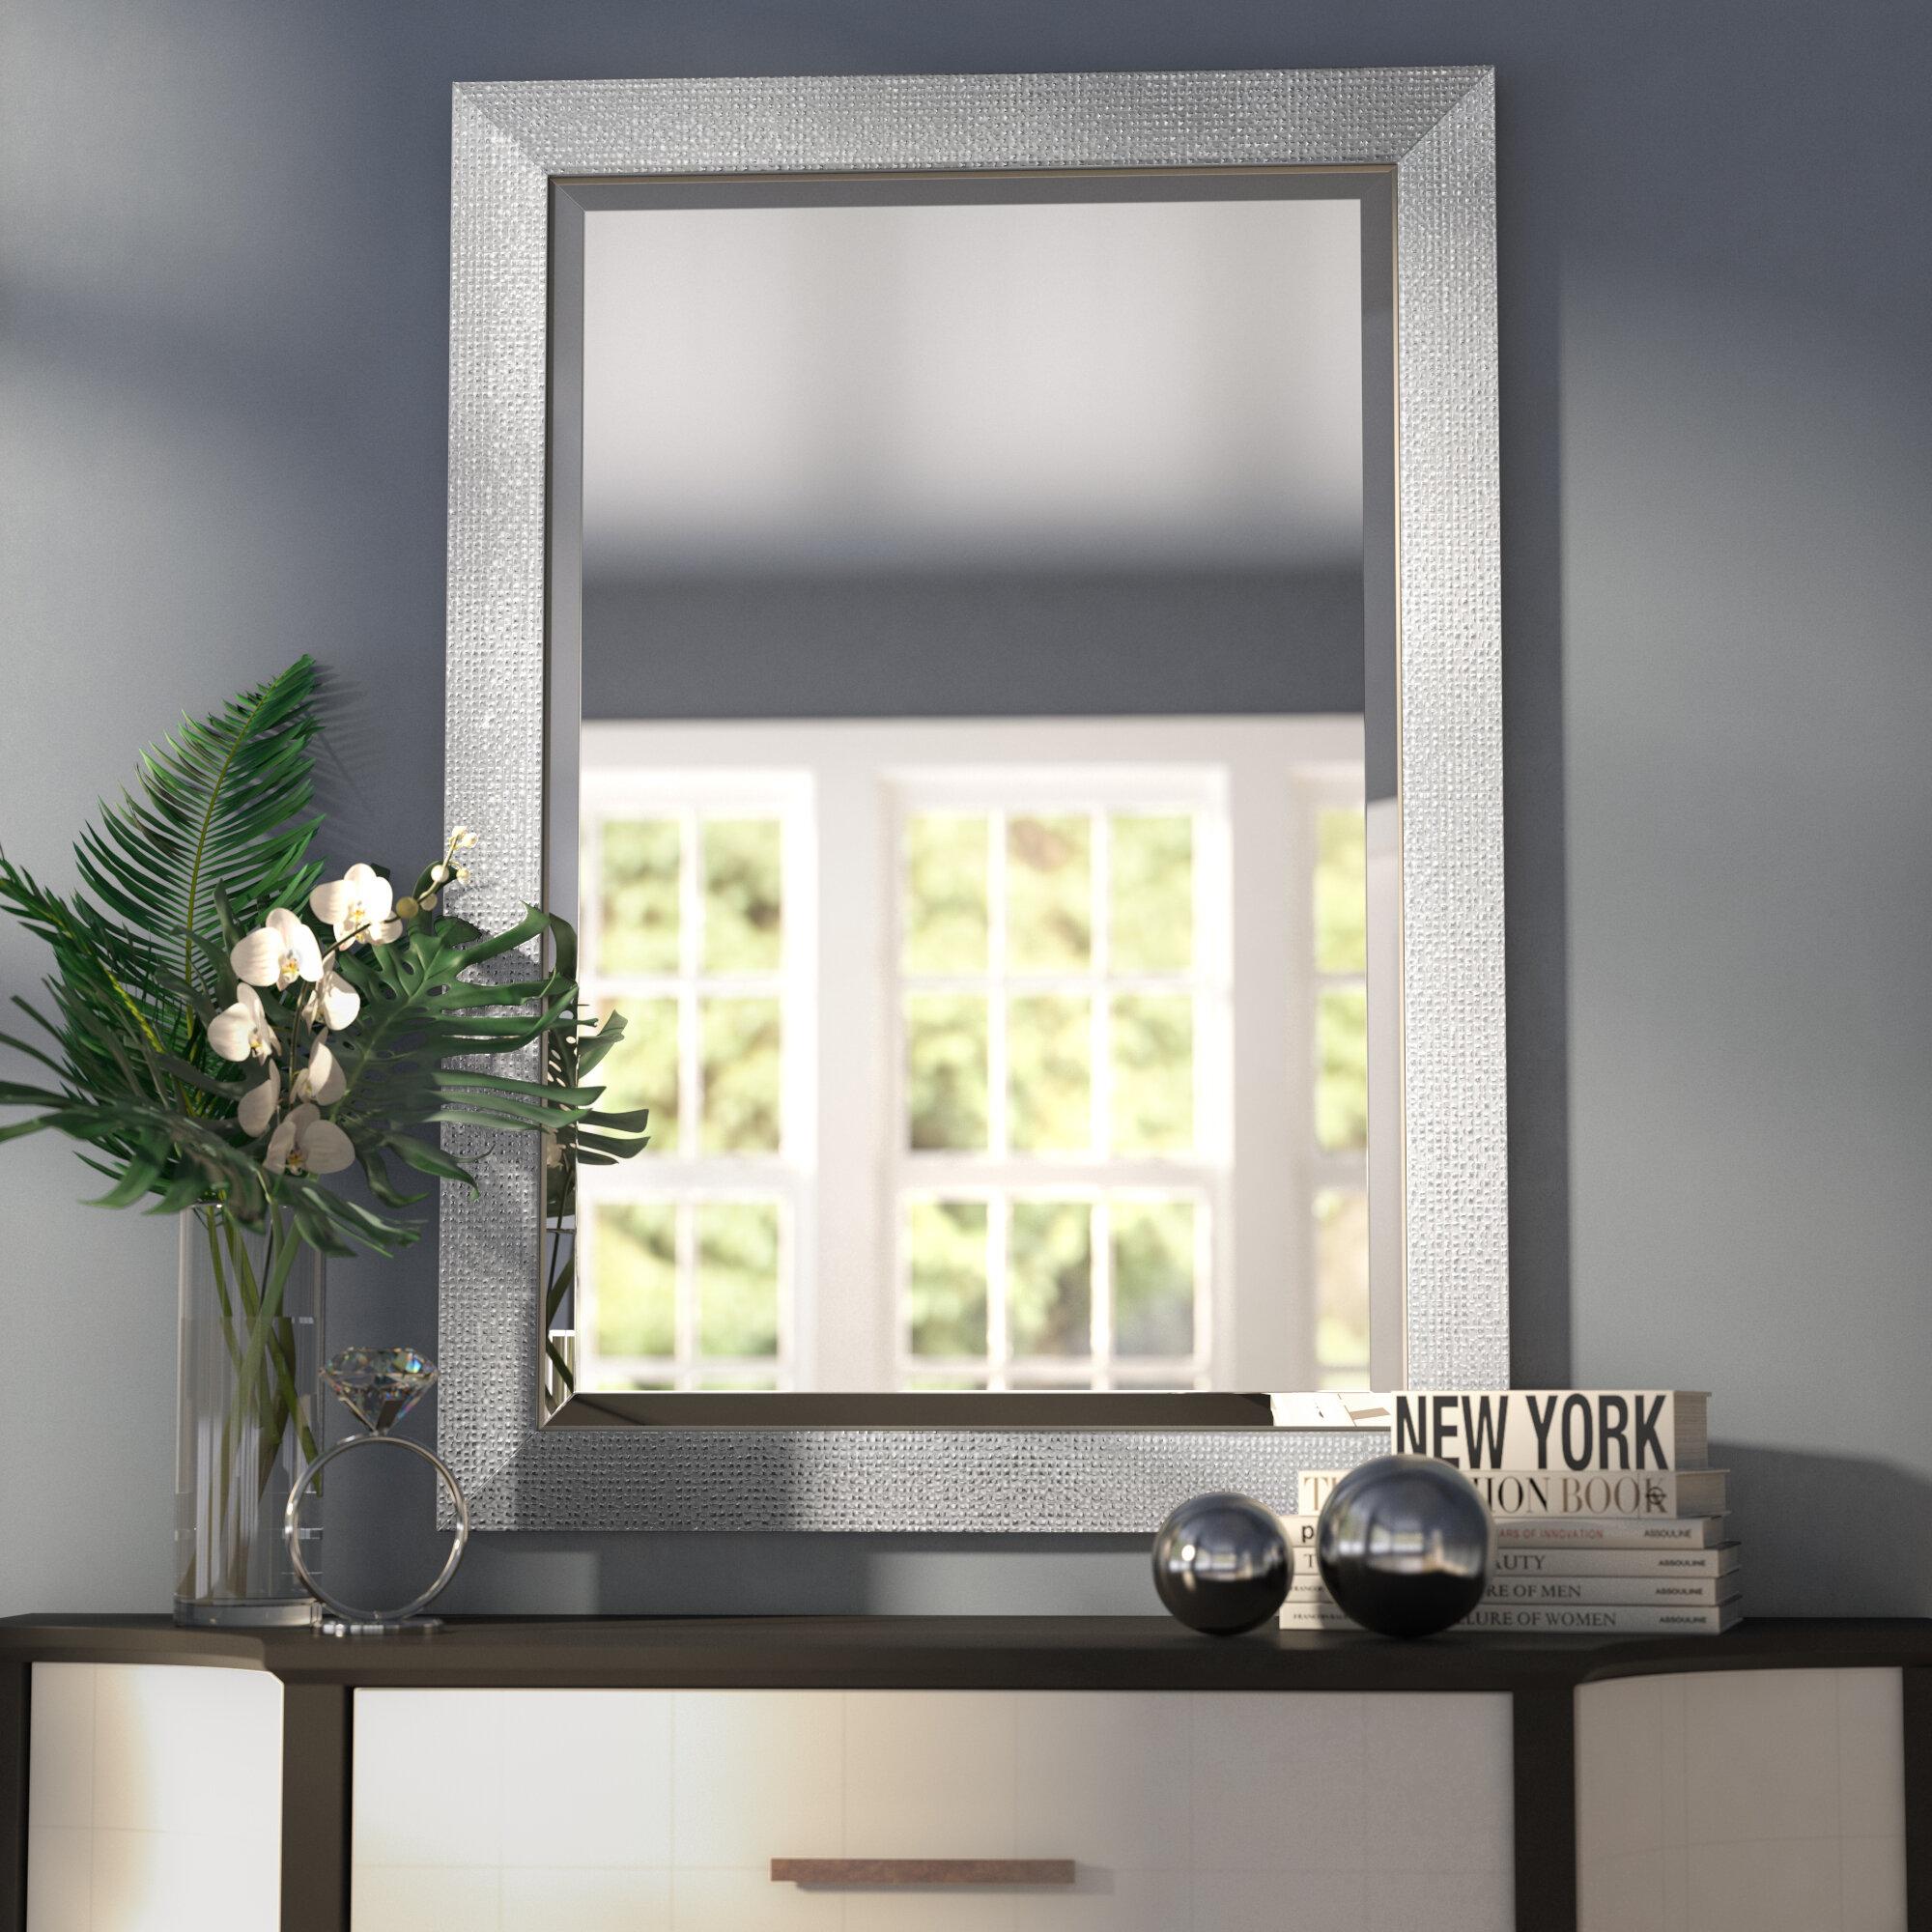 Beveled Bathroom/Vanity Wall Mirror